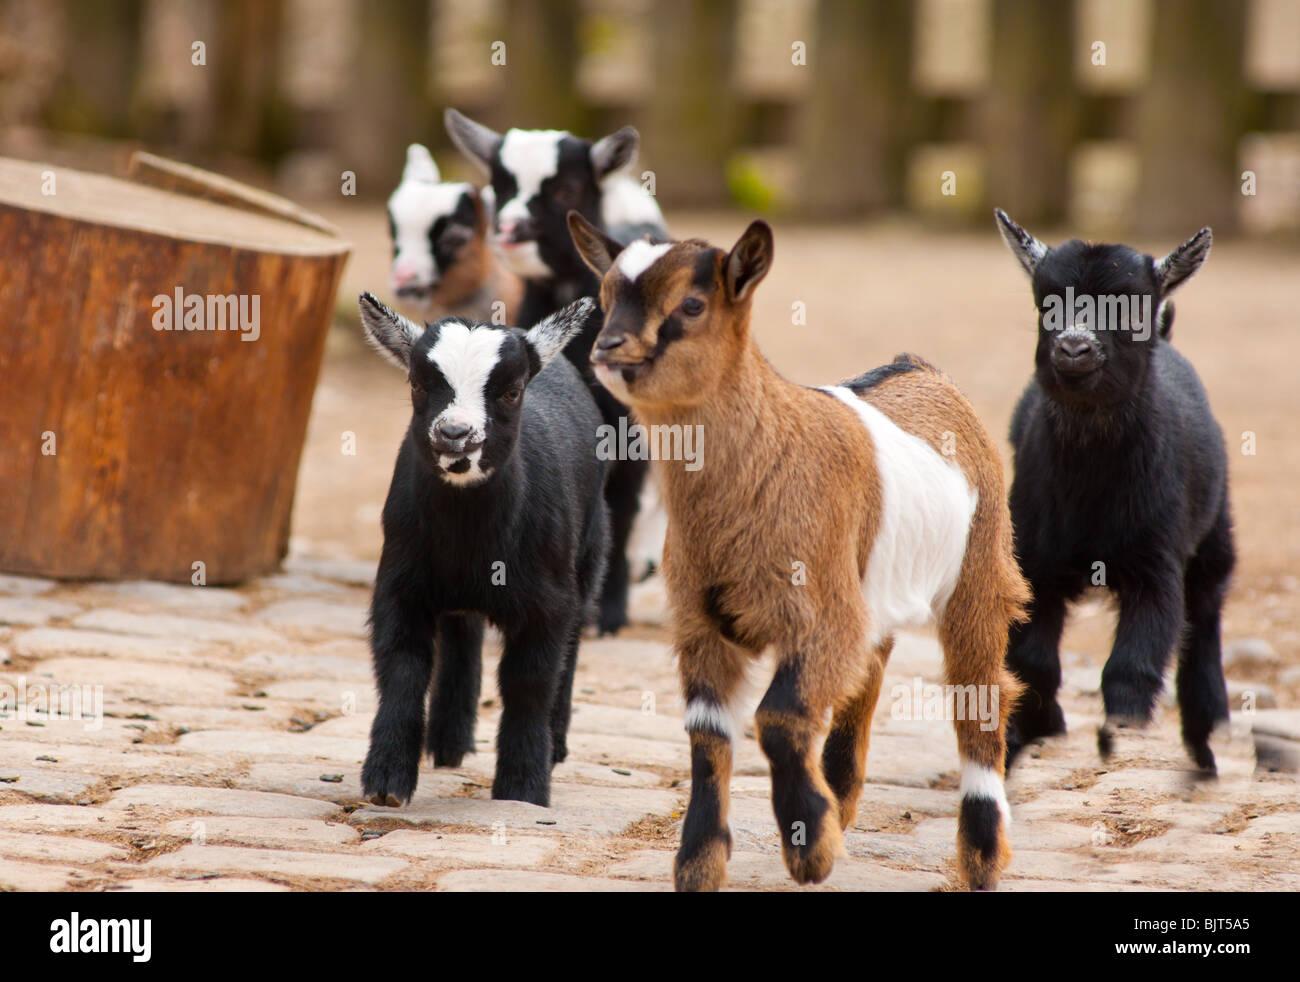 Baby goats running - Stock Image